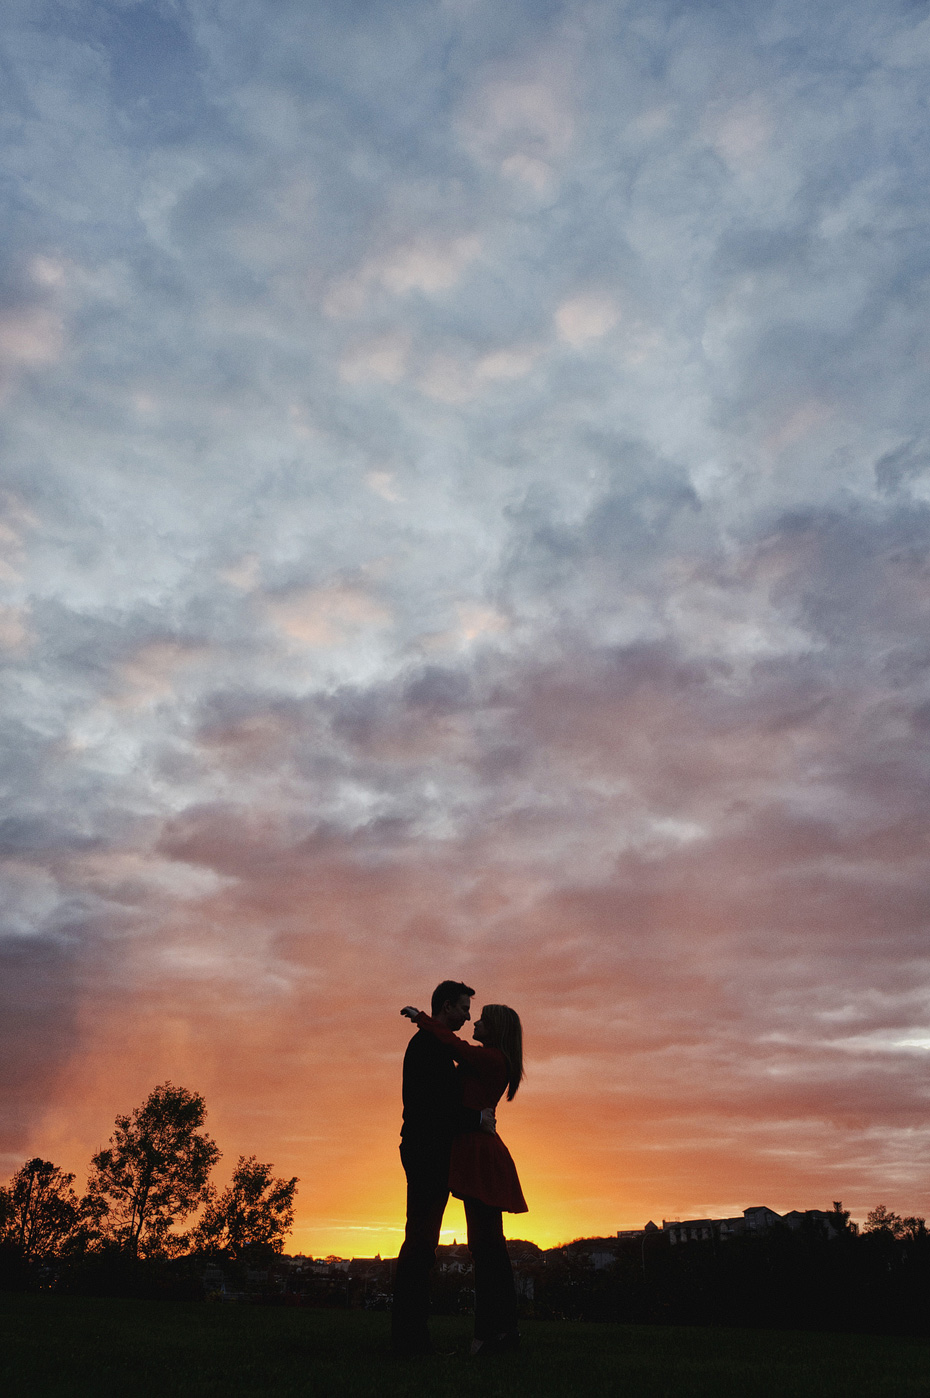 Sean McGrath Photography - Best of 2011